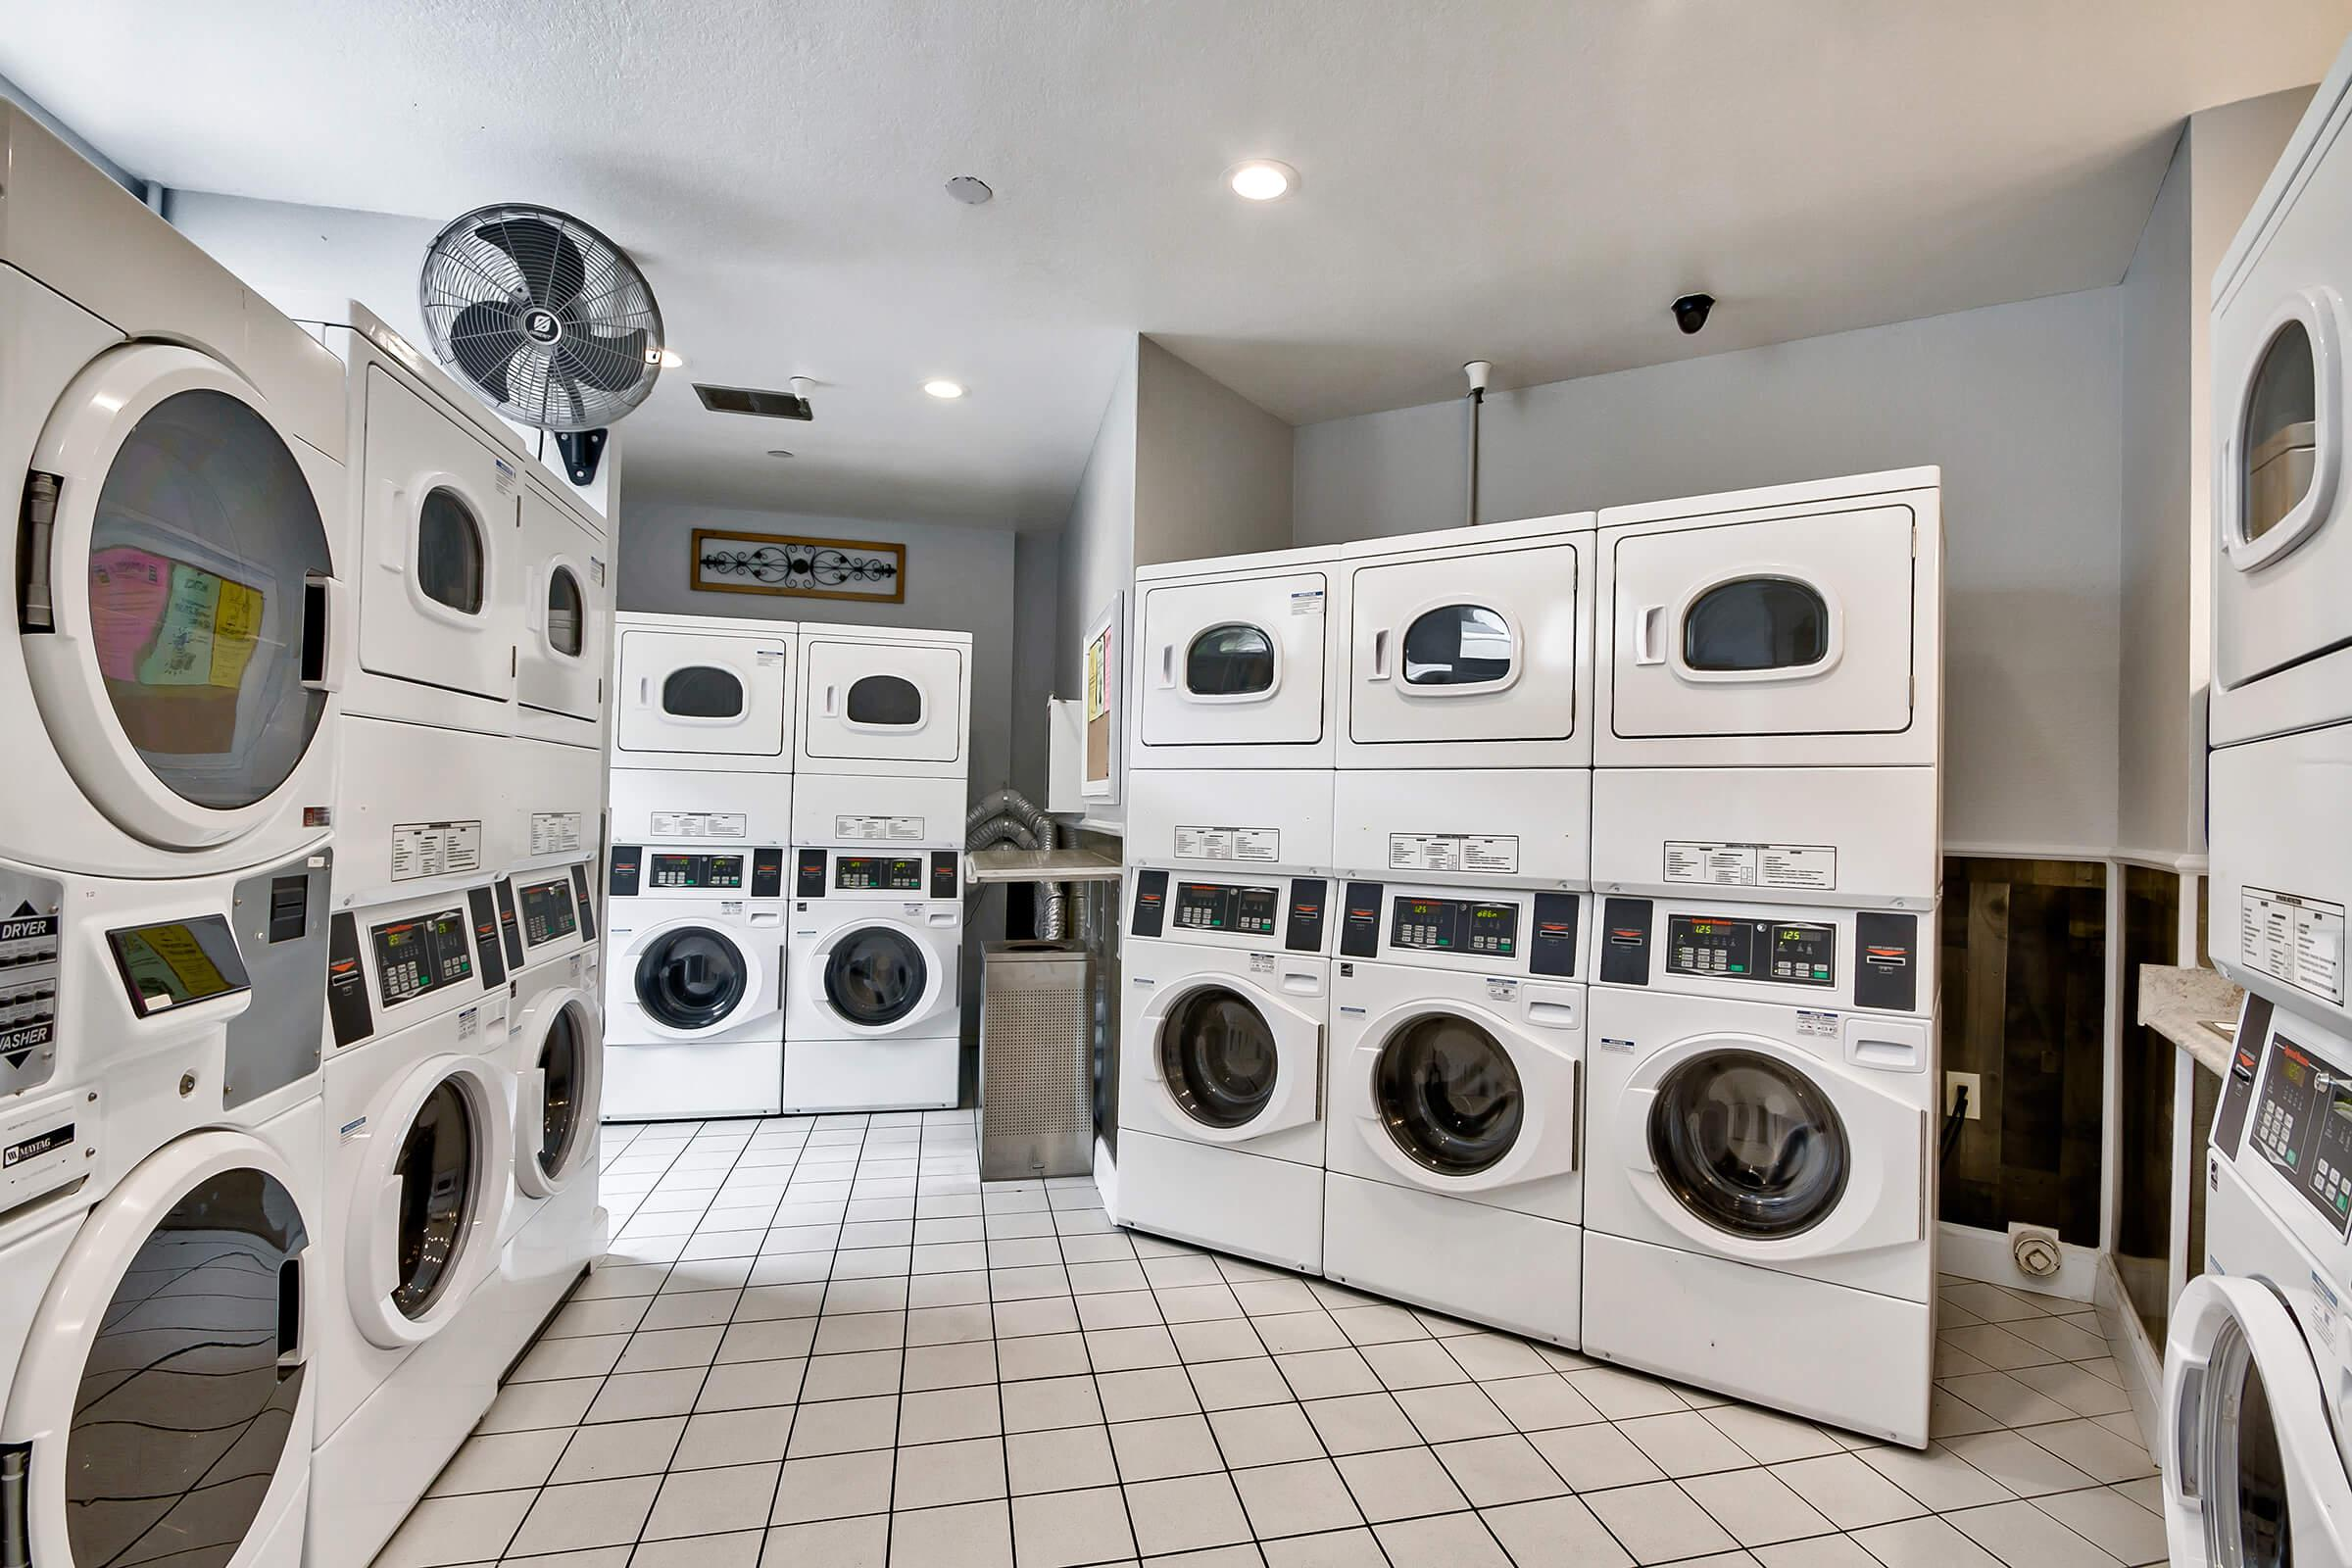 Laundry-Facilities_575-W-19Th-St-Costa-Mesa-CA_Park-Center-Place_RPI_II-280960-11.jpg